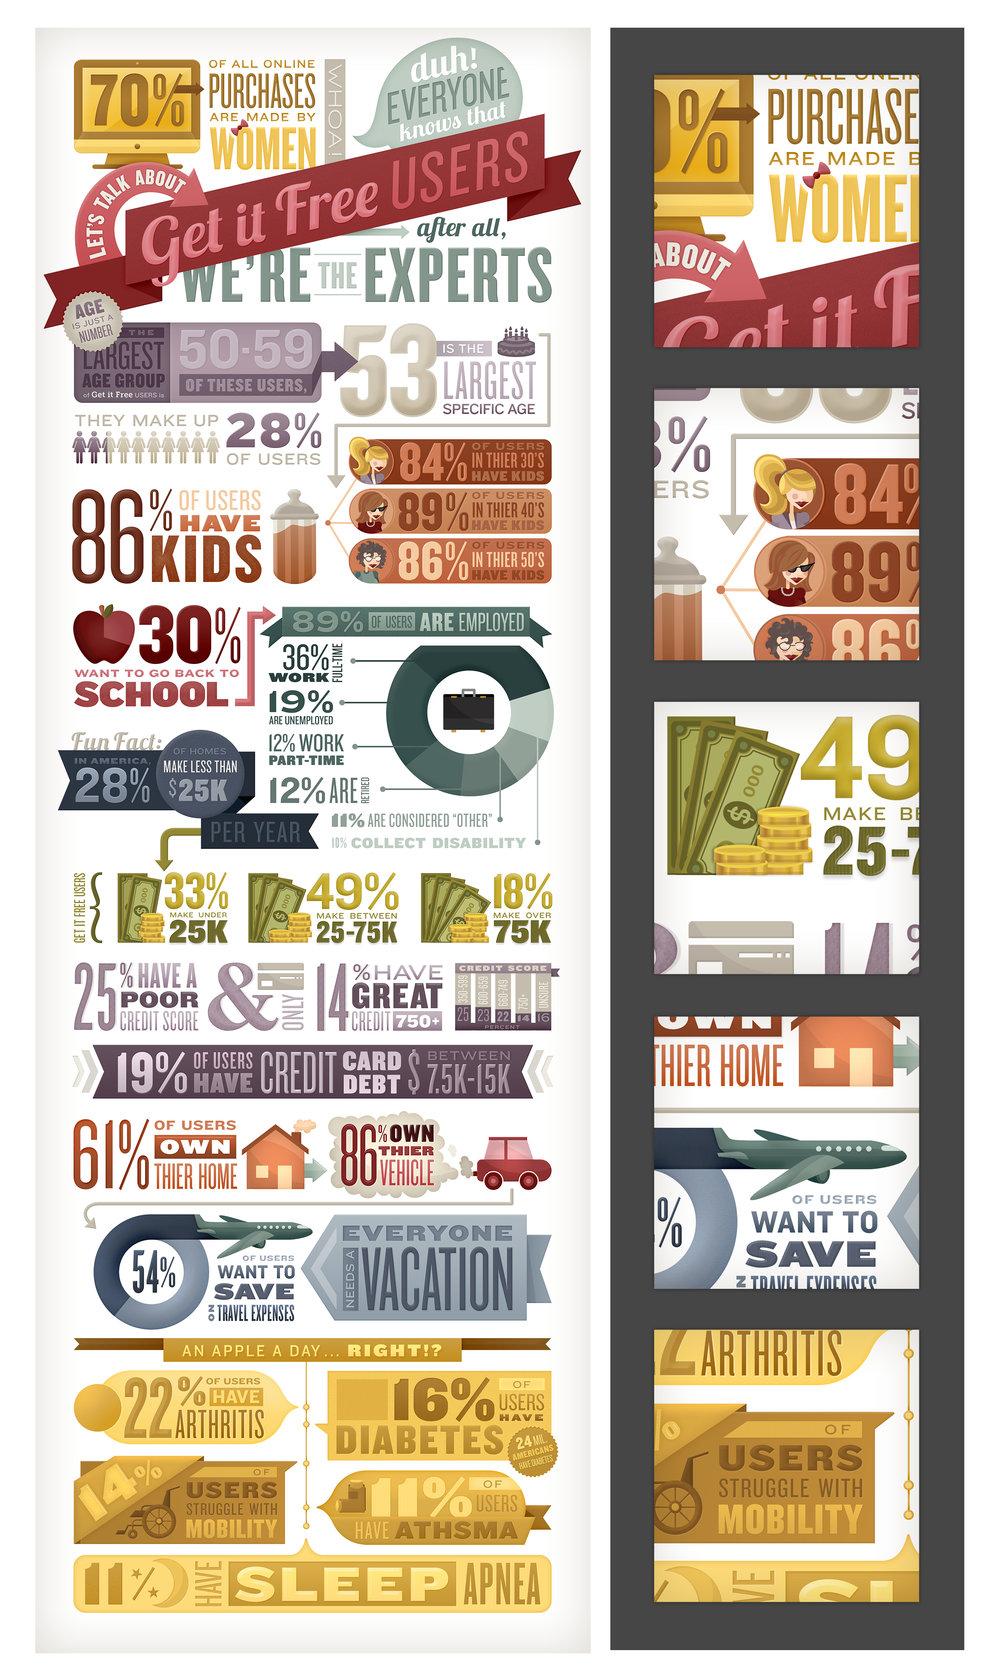 2_Infographic.jpg